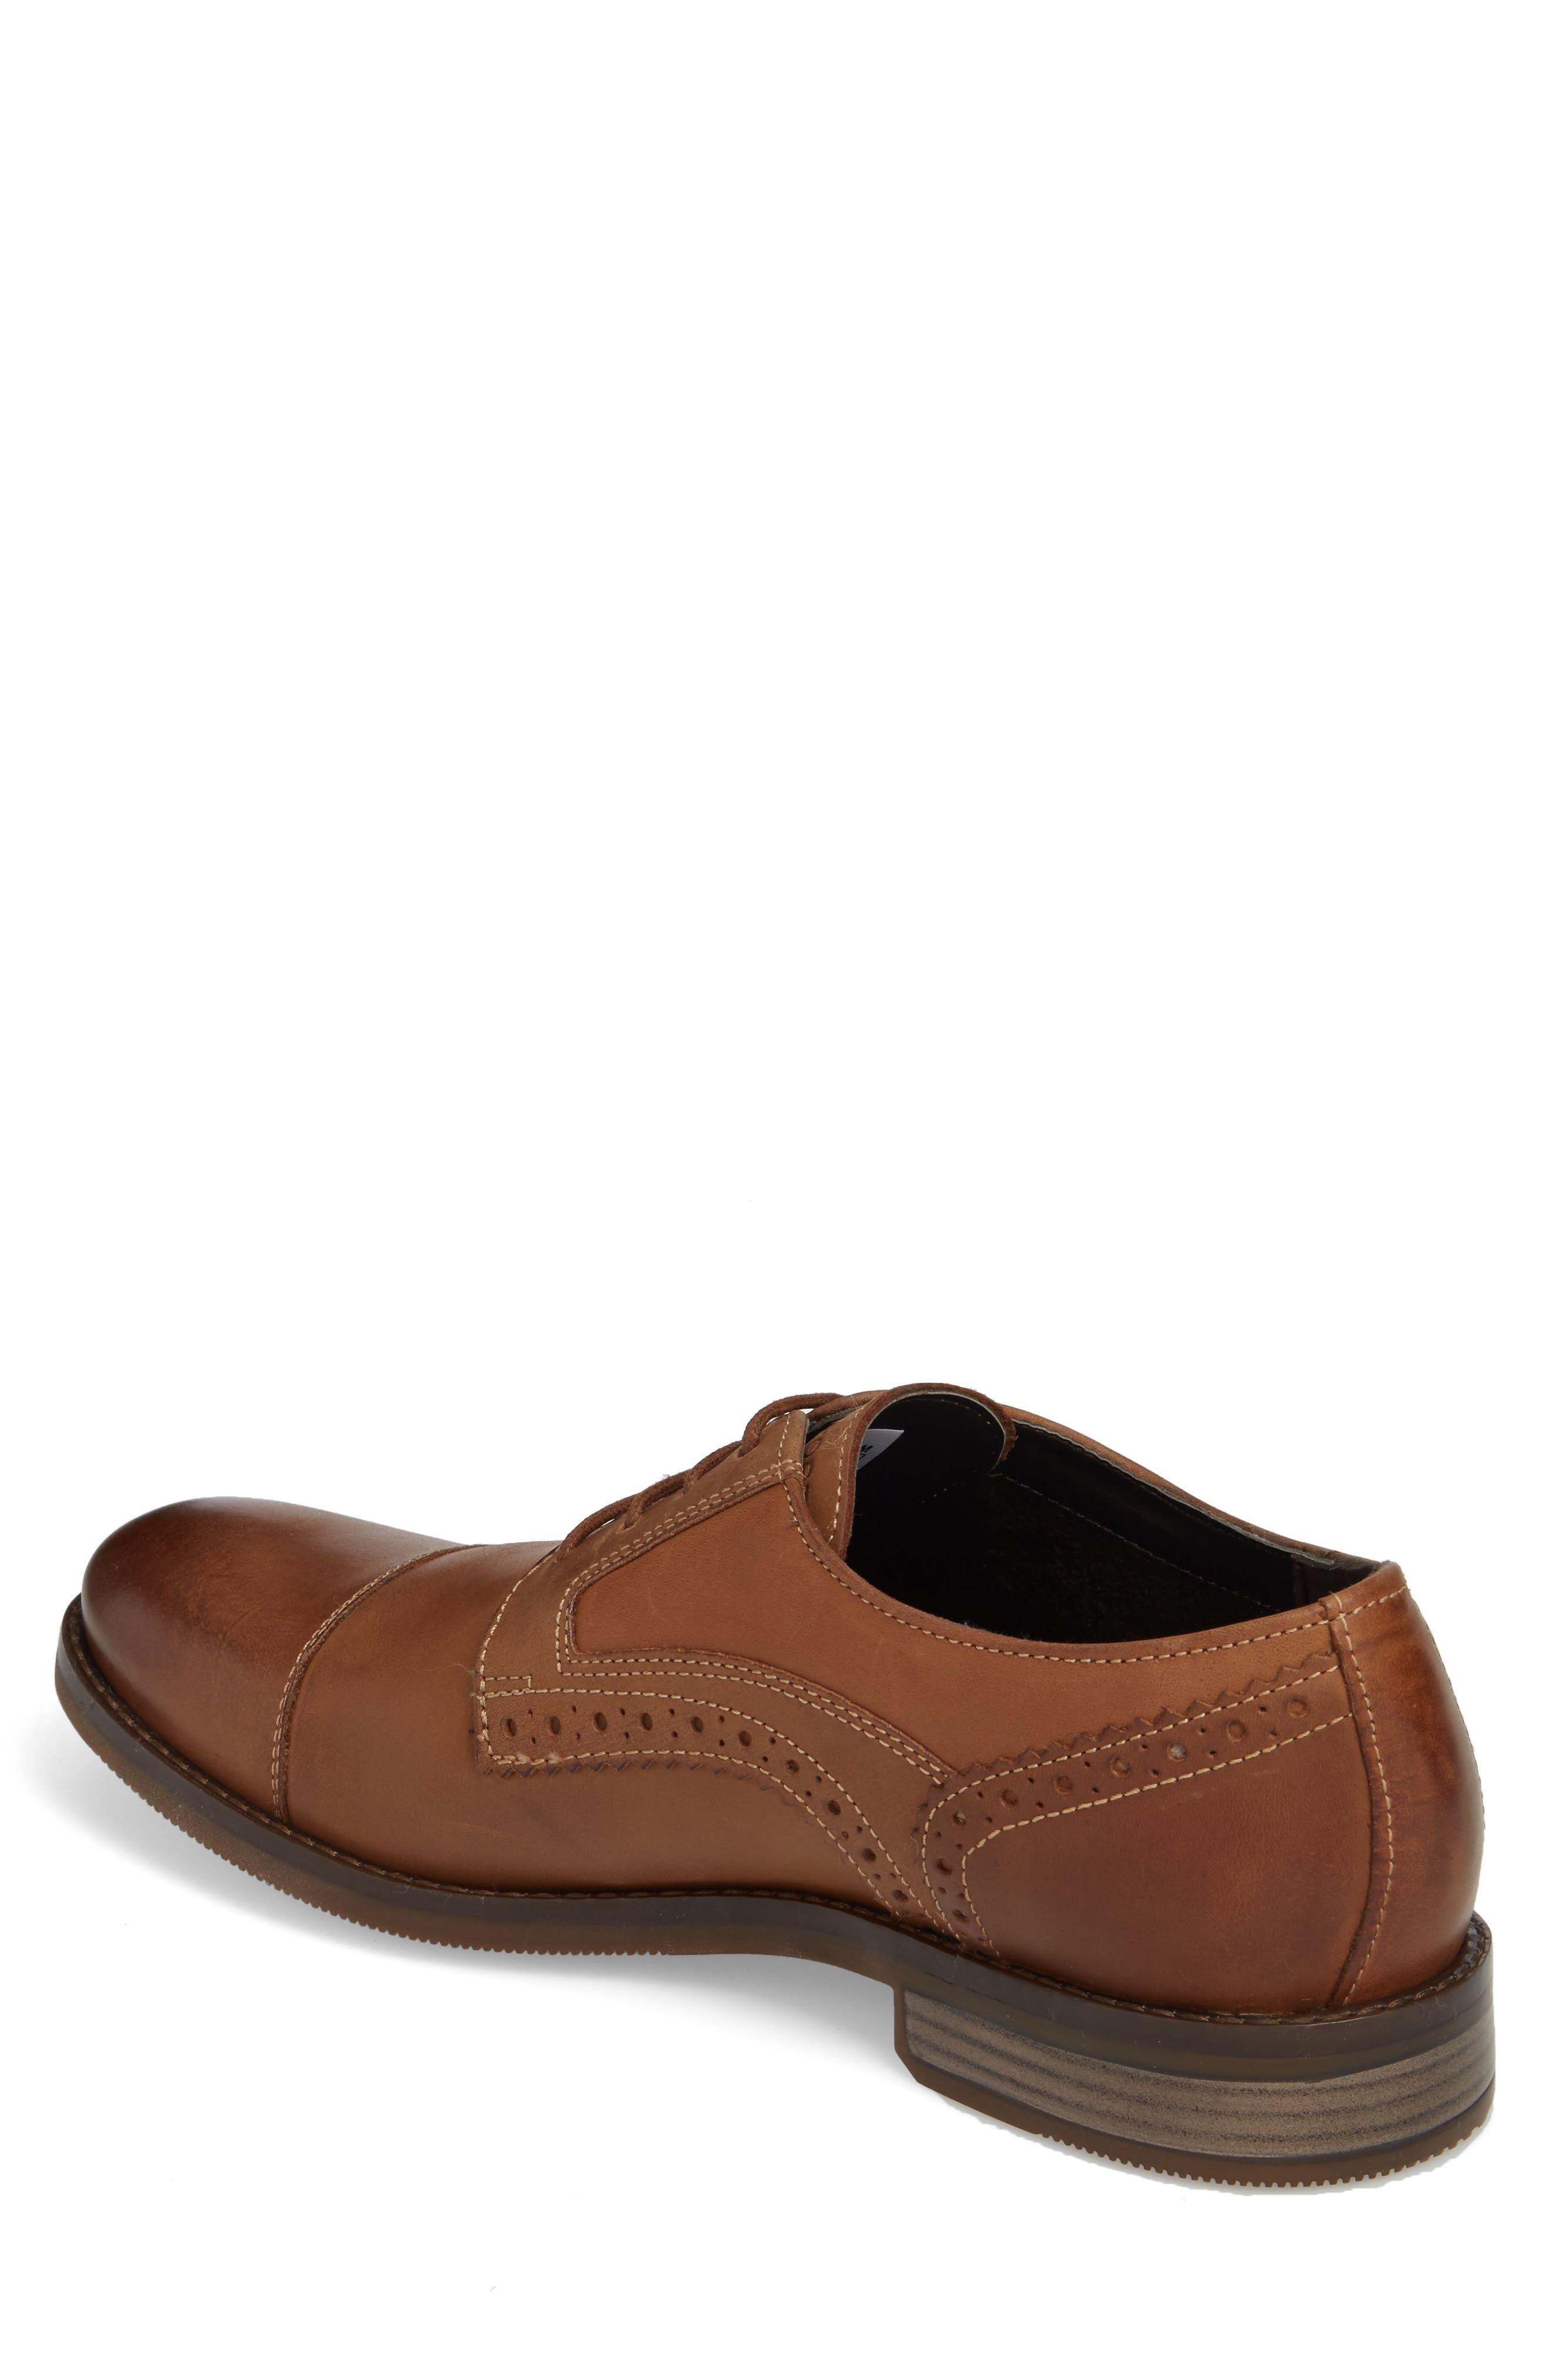 Wynston Cap Toe Blucher,                             Alternate thumbnail 2, color,                             Tobacco Leather